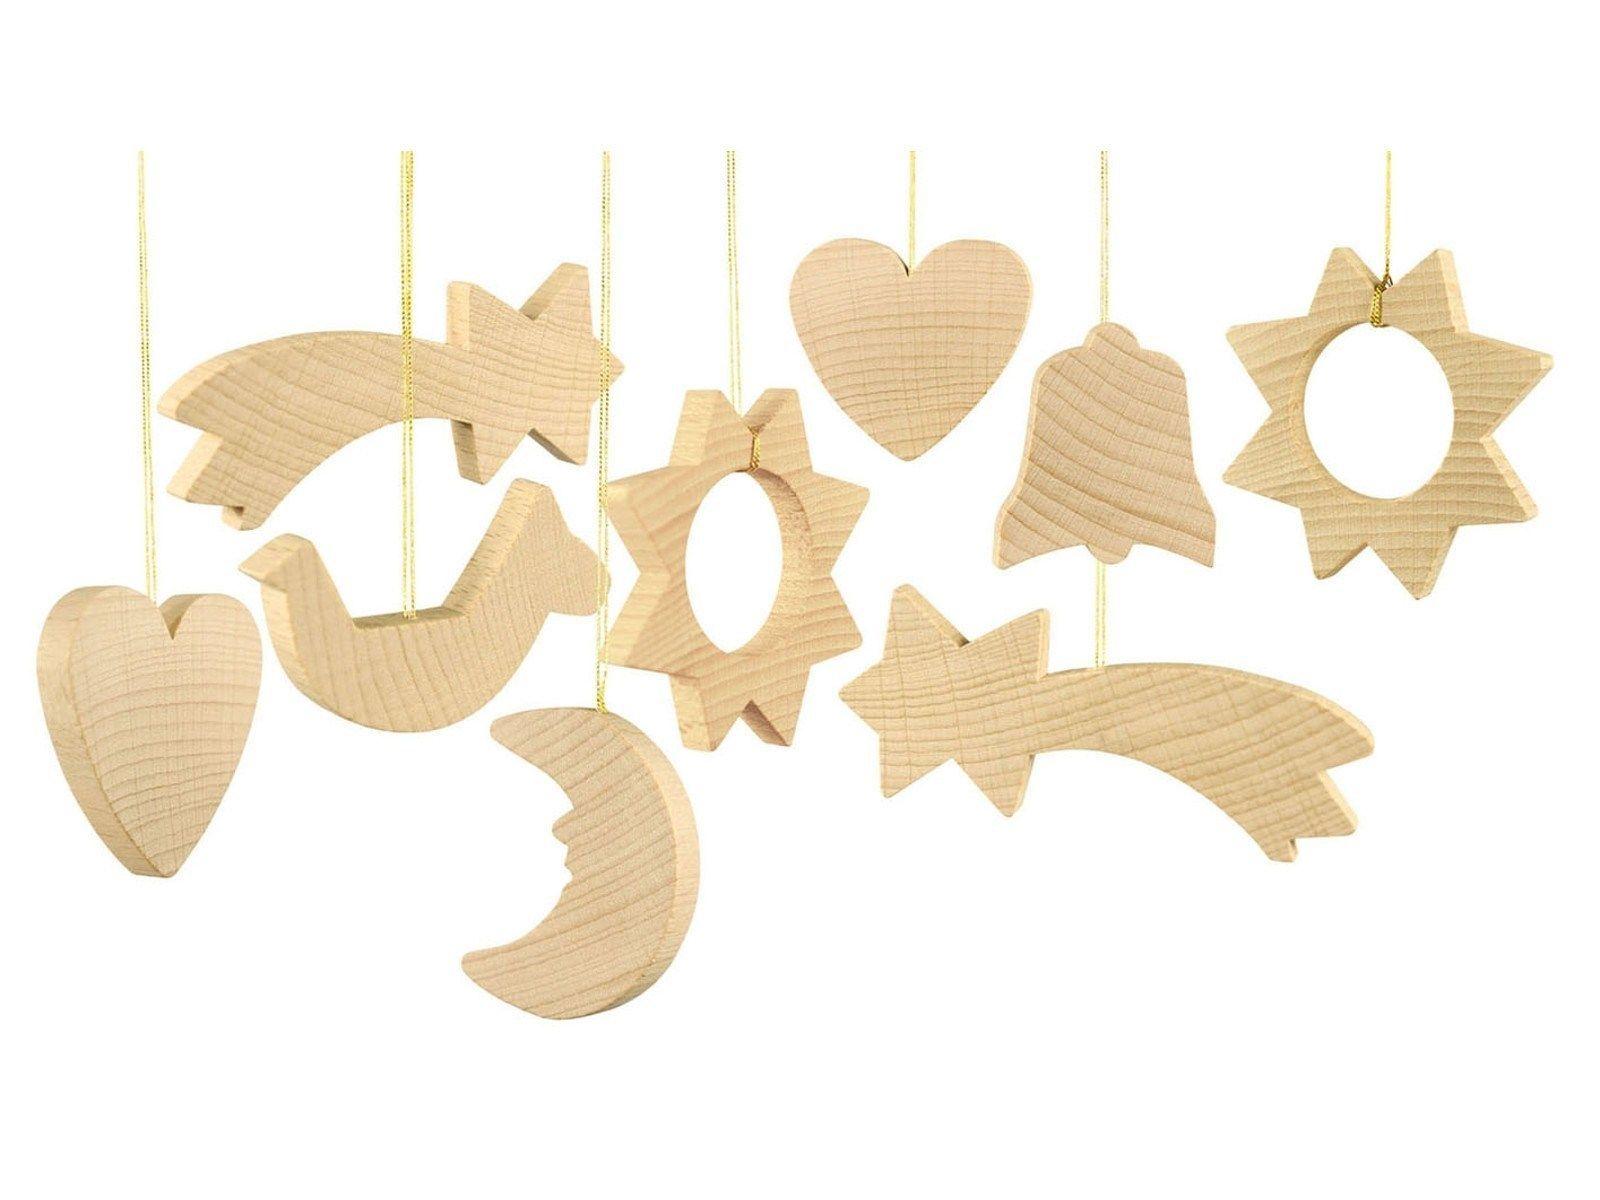 Nemmer Christbaumschmuck Aus Holz Flachmodelle 24 Teile